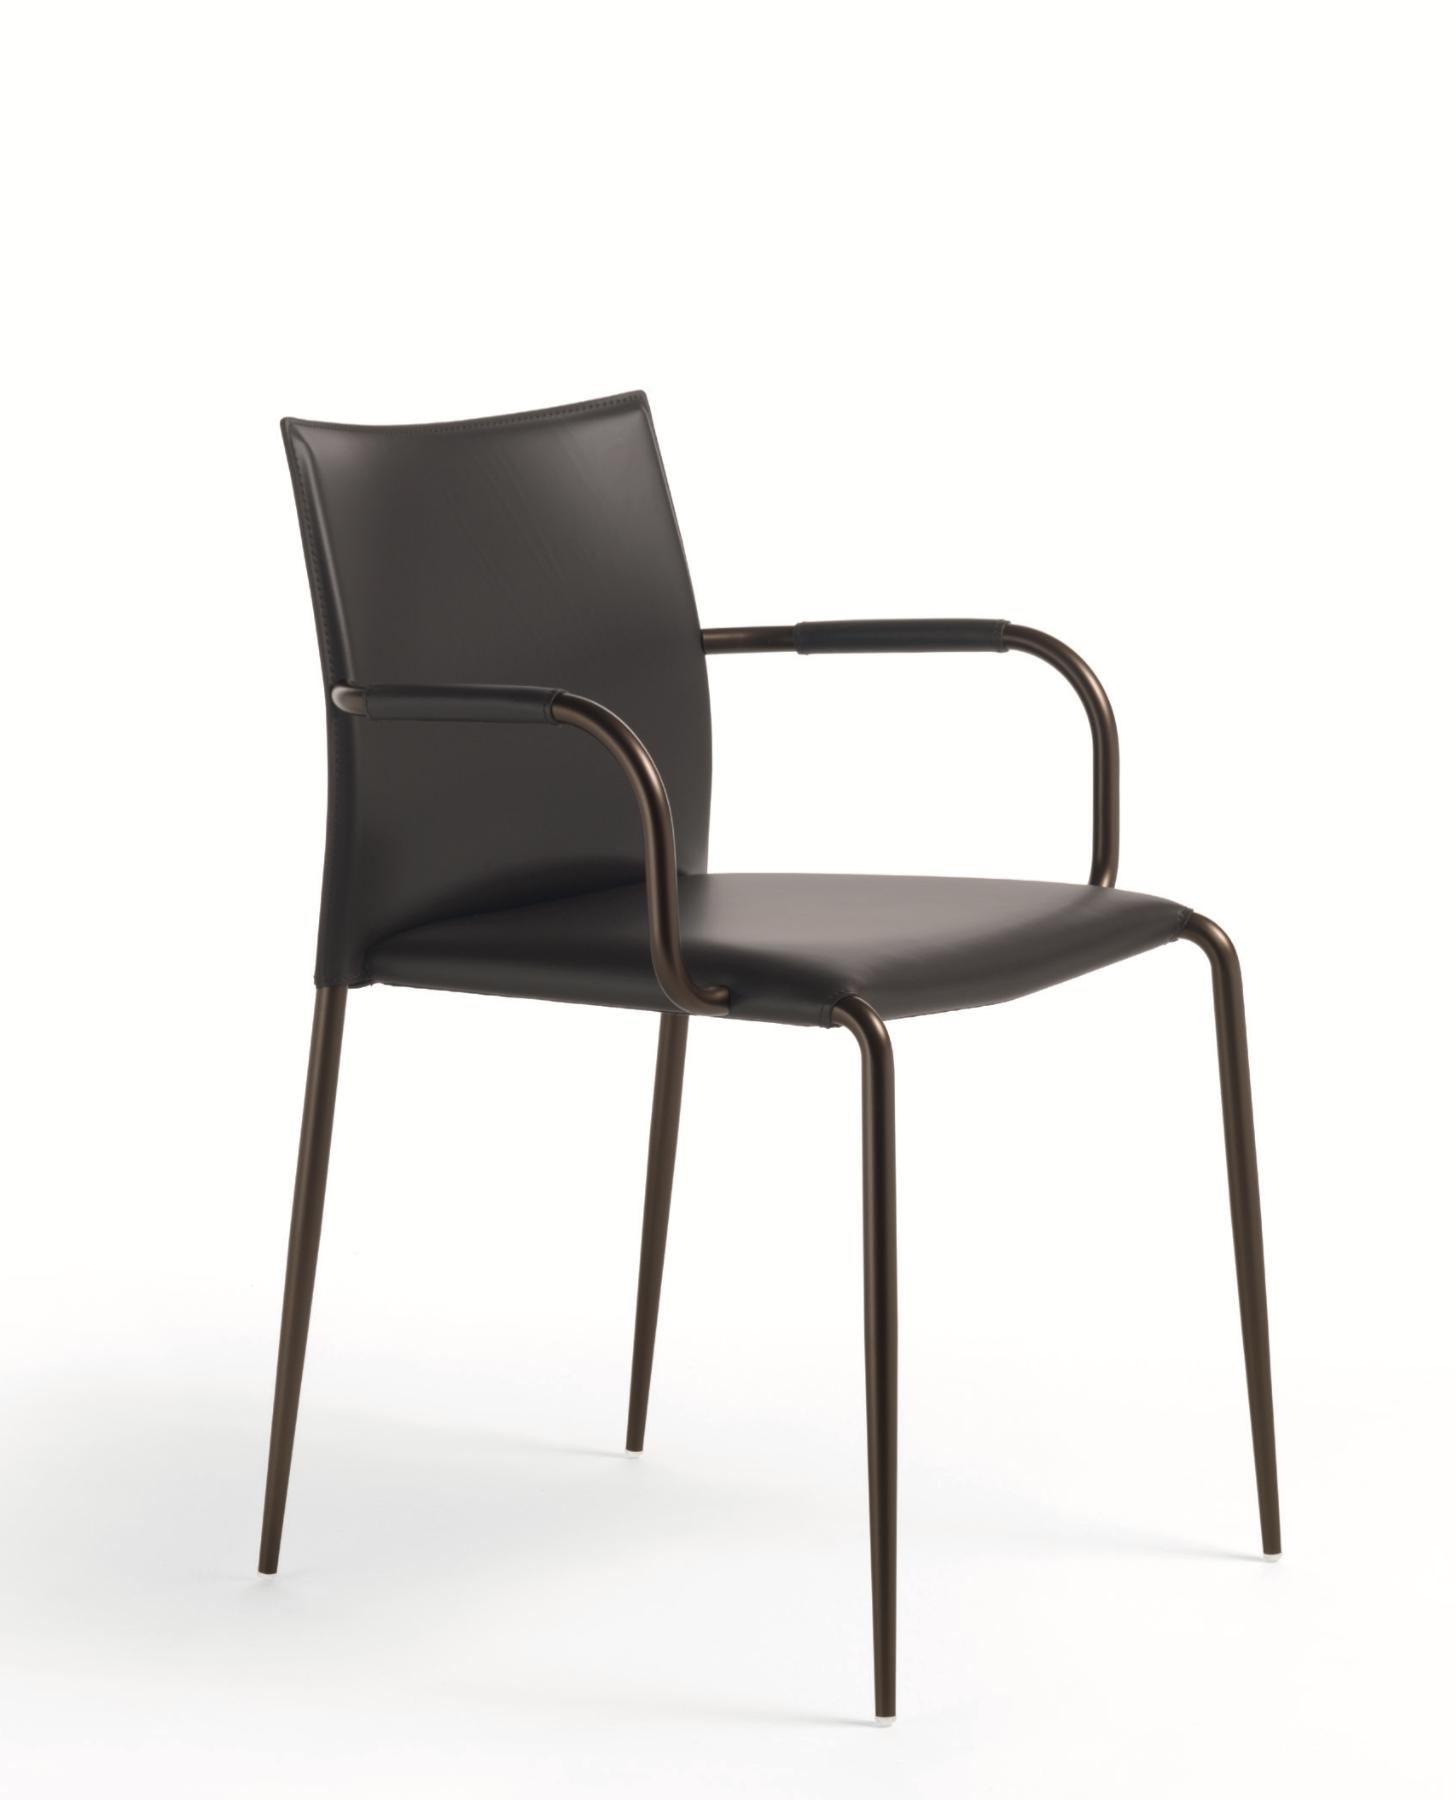 MDC 105 Modern Dining Chairs